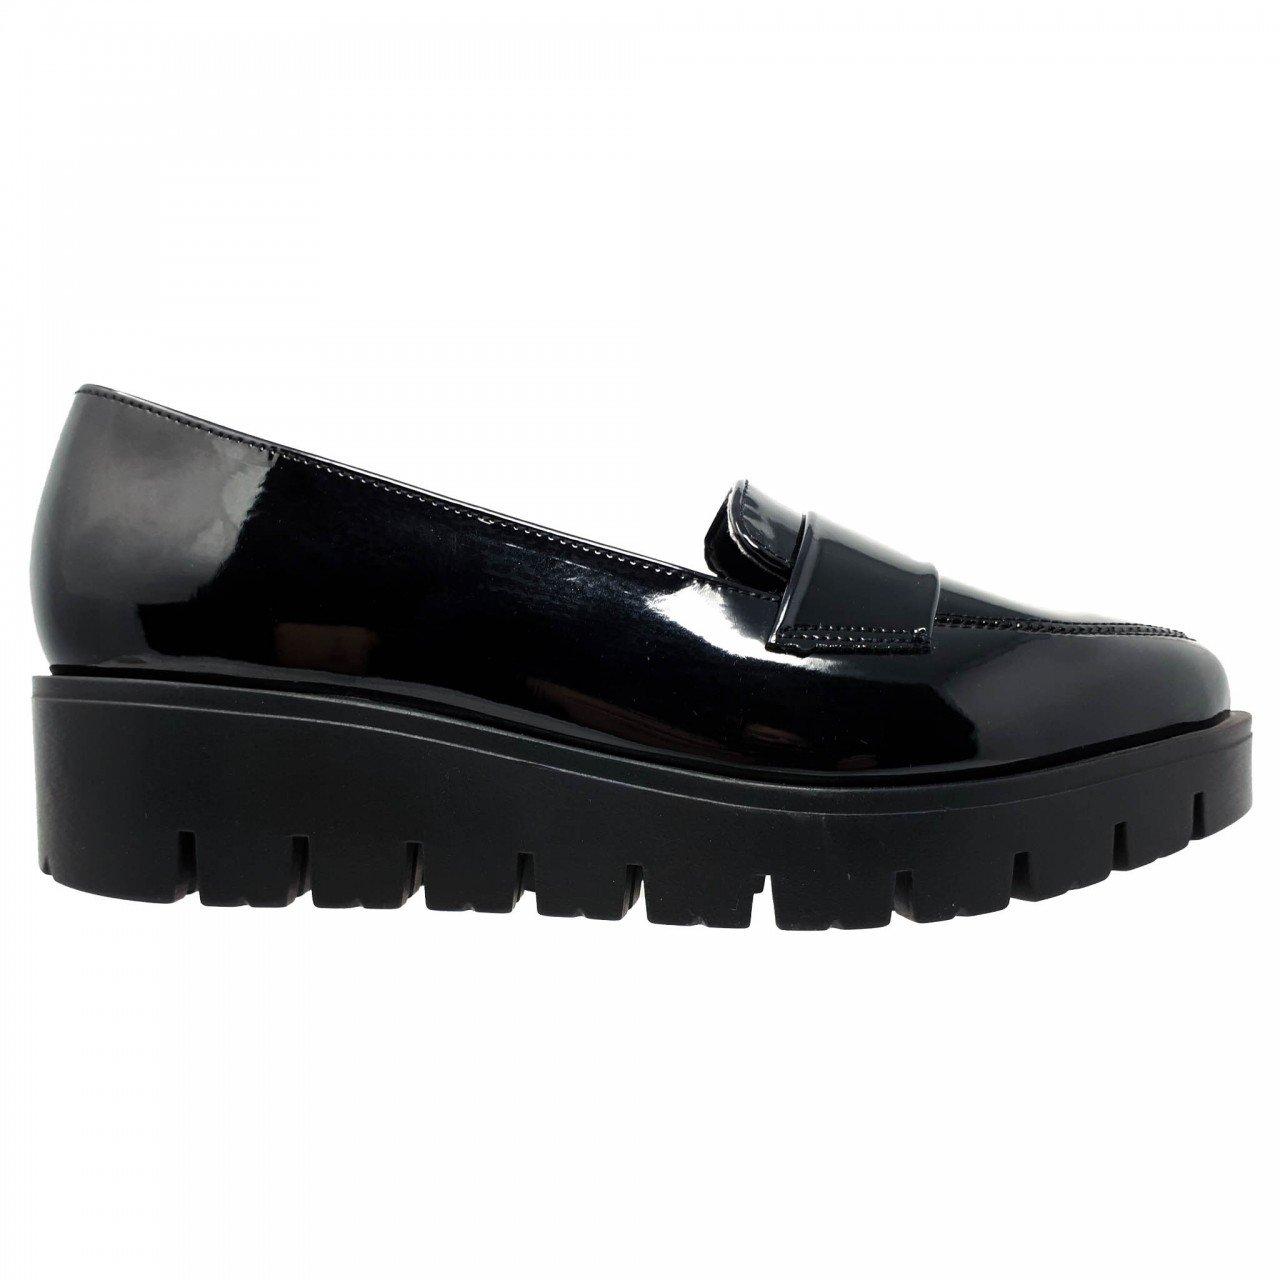 Zapato mocasín charol negro para mujer Perugia 40074